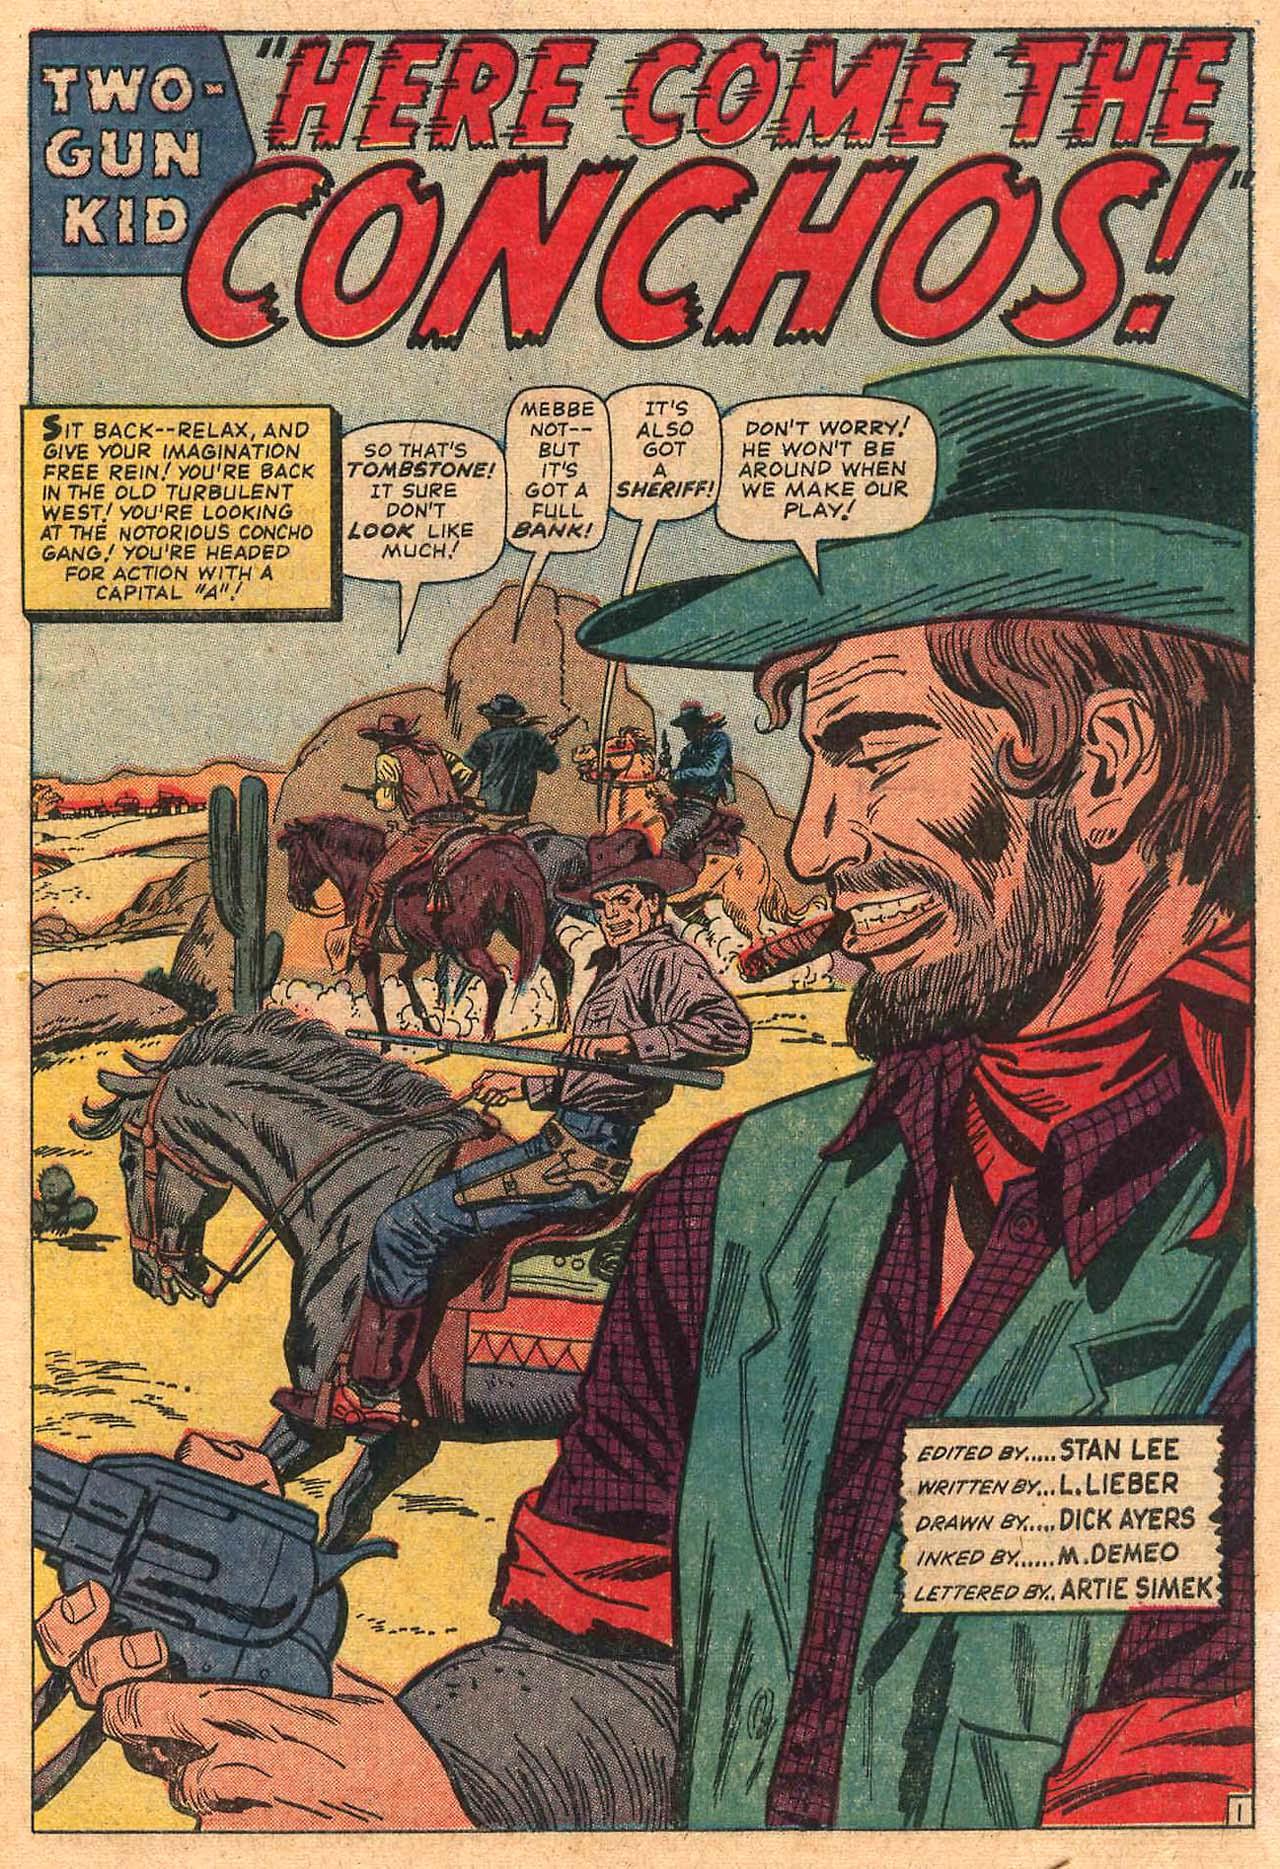 Read online Two-Gun Kid comic -  Issue #82 - 3